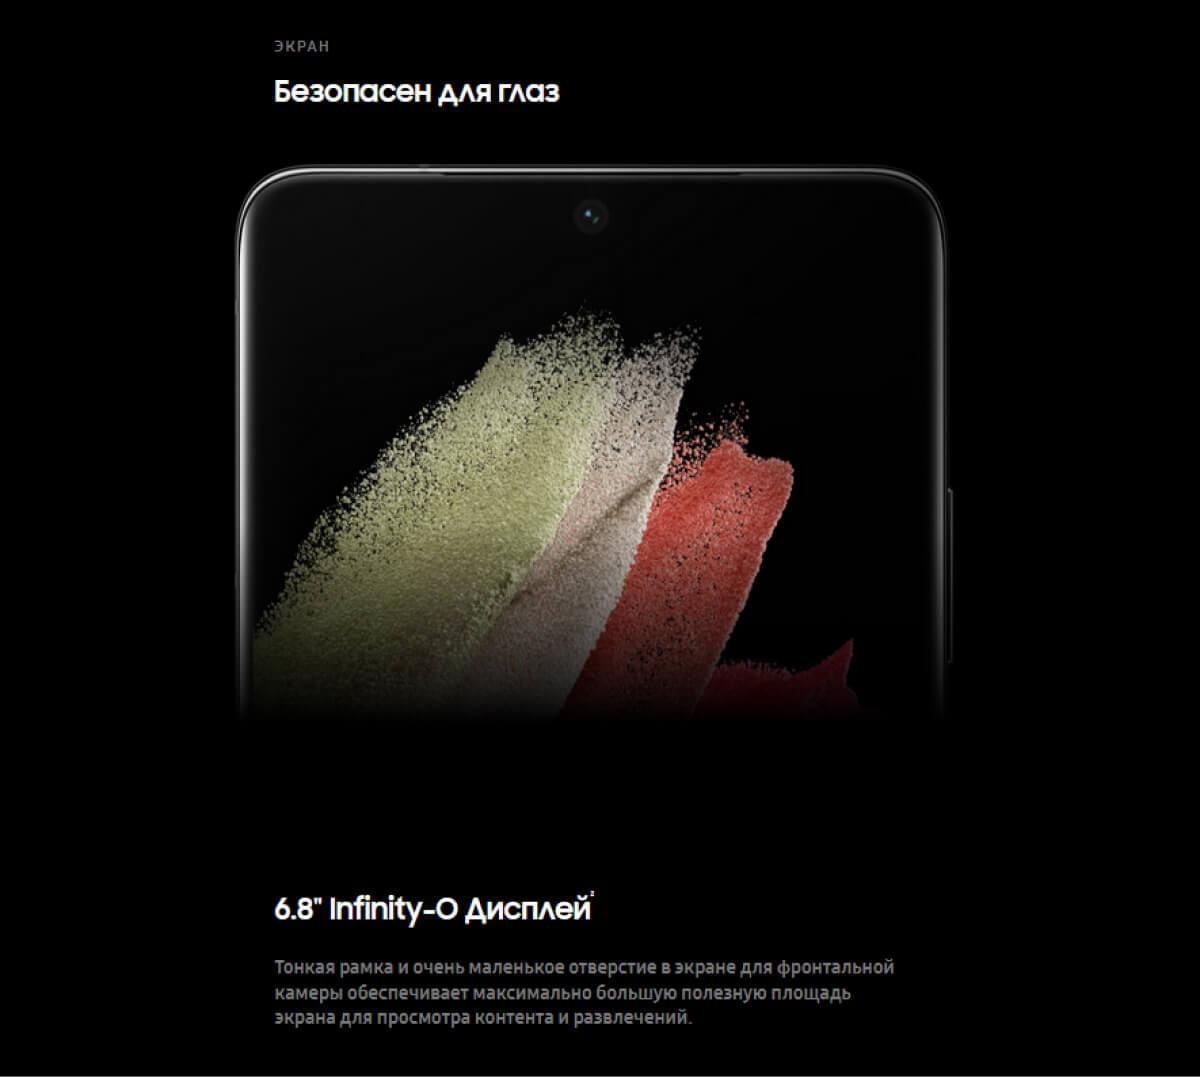 Samsung Galaxy S21 Ultra 5G 12/256 GB Чёрный фантом